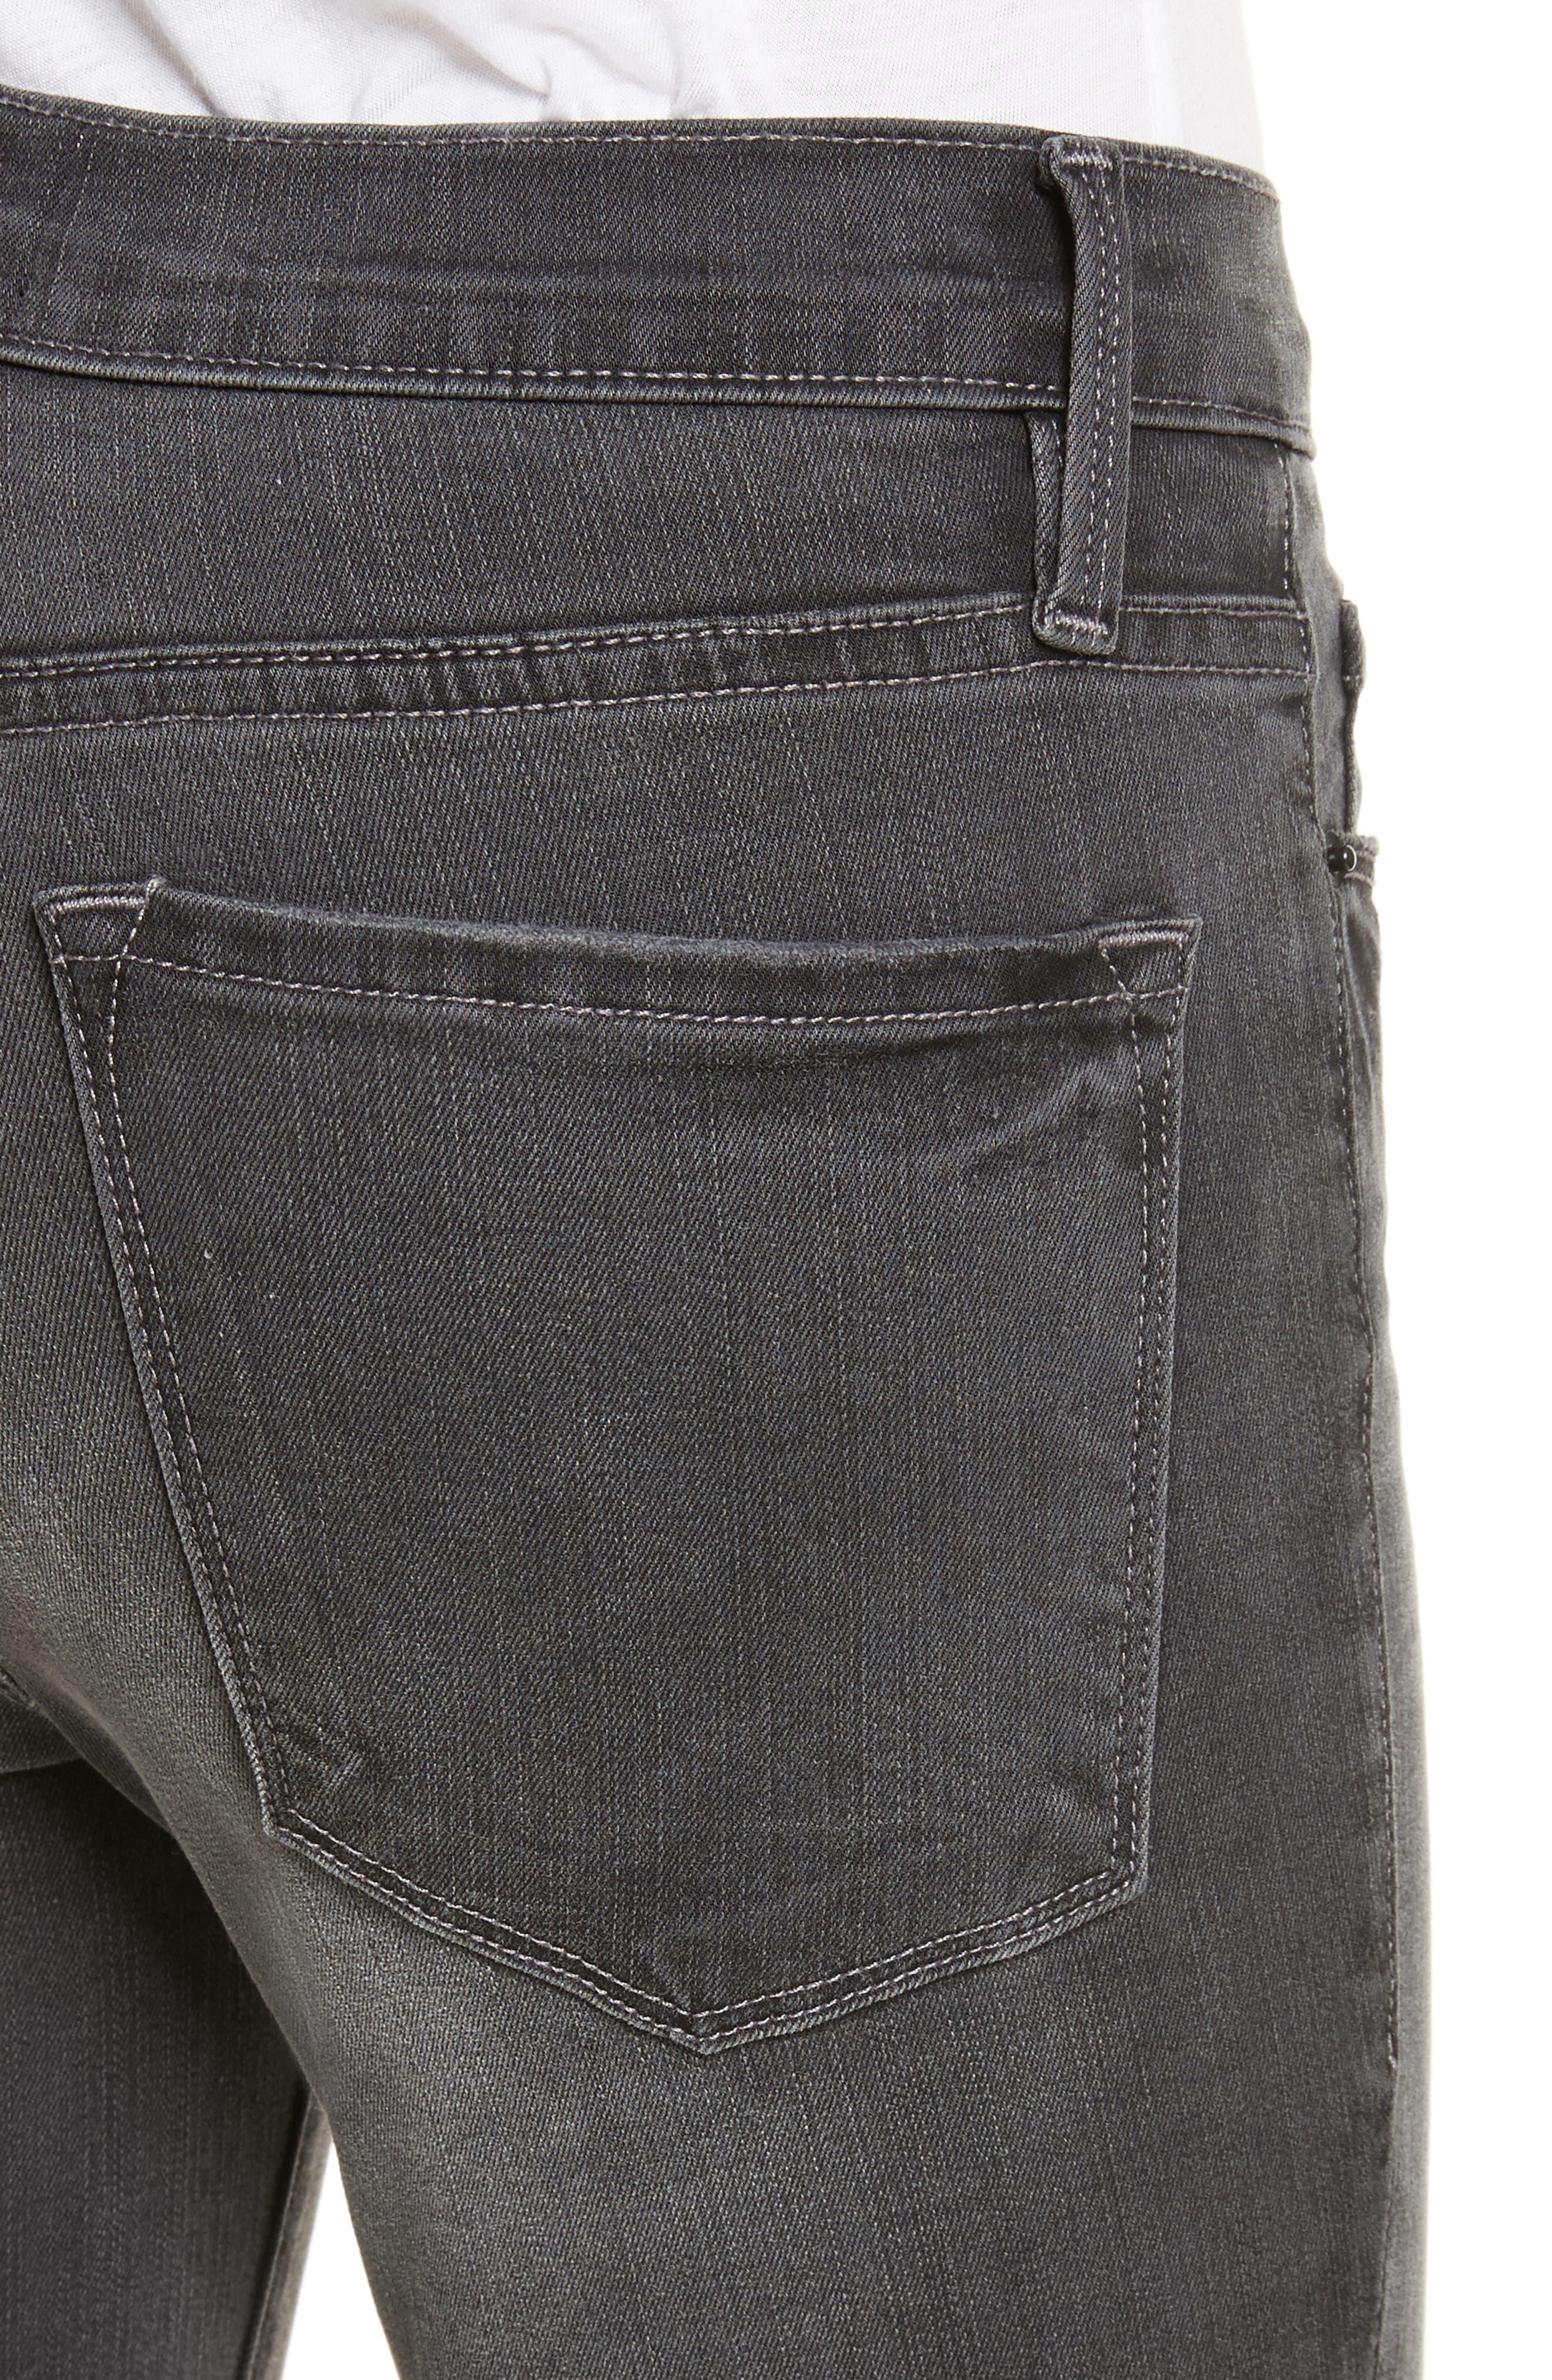 Le Skinny de Jeanne Ankle Jeans,                             Alternate thumbnail 4, color,                             Harlow